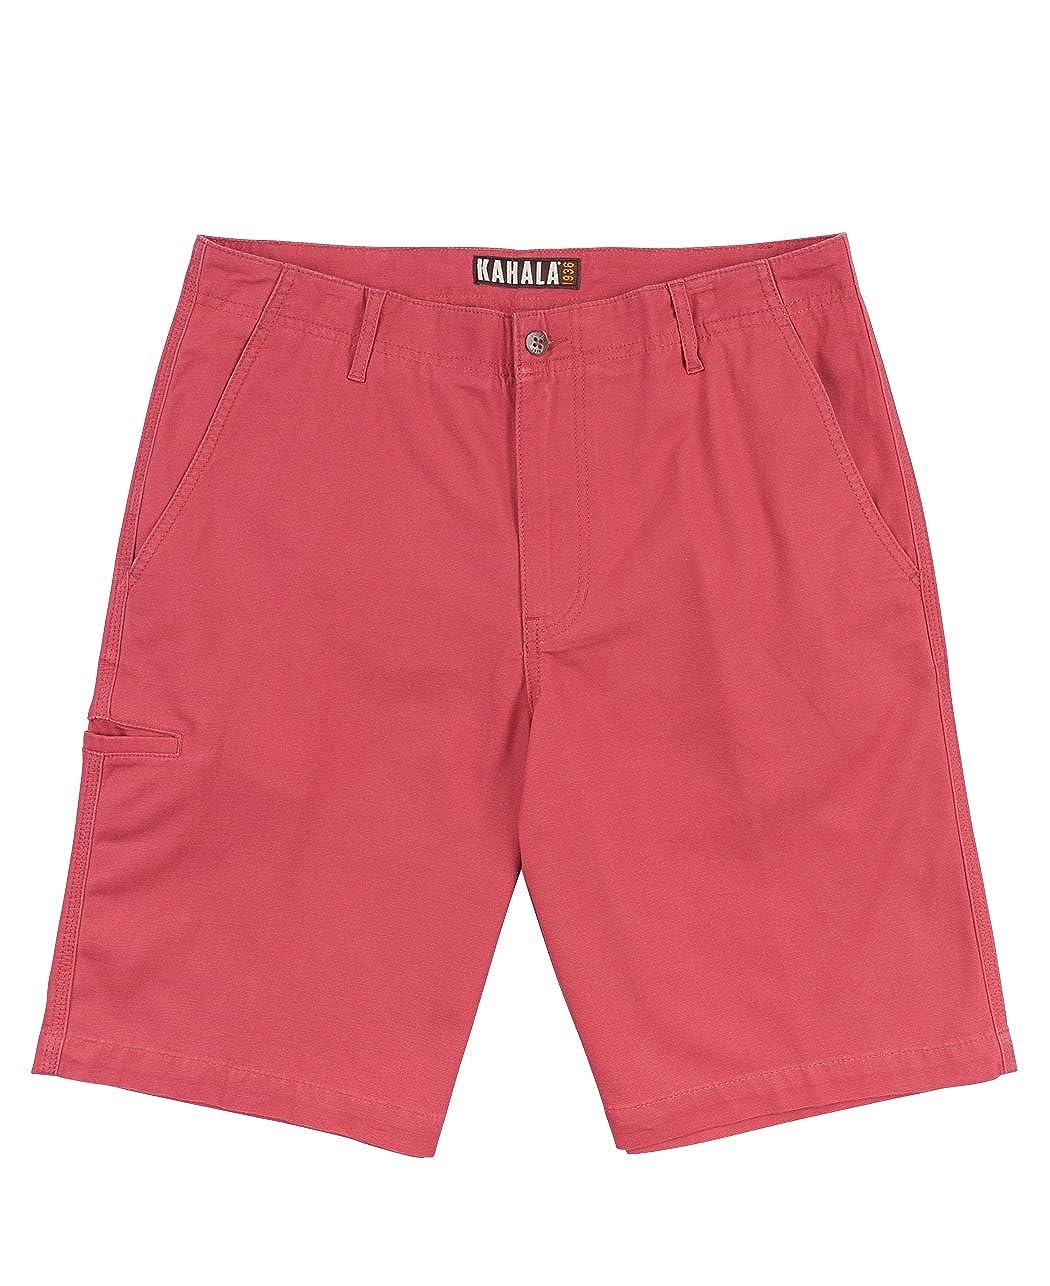 Amazon.com: Kahala Kaniala Walk corto por: Clothing